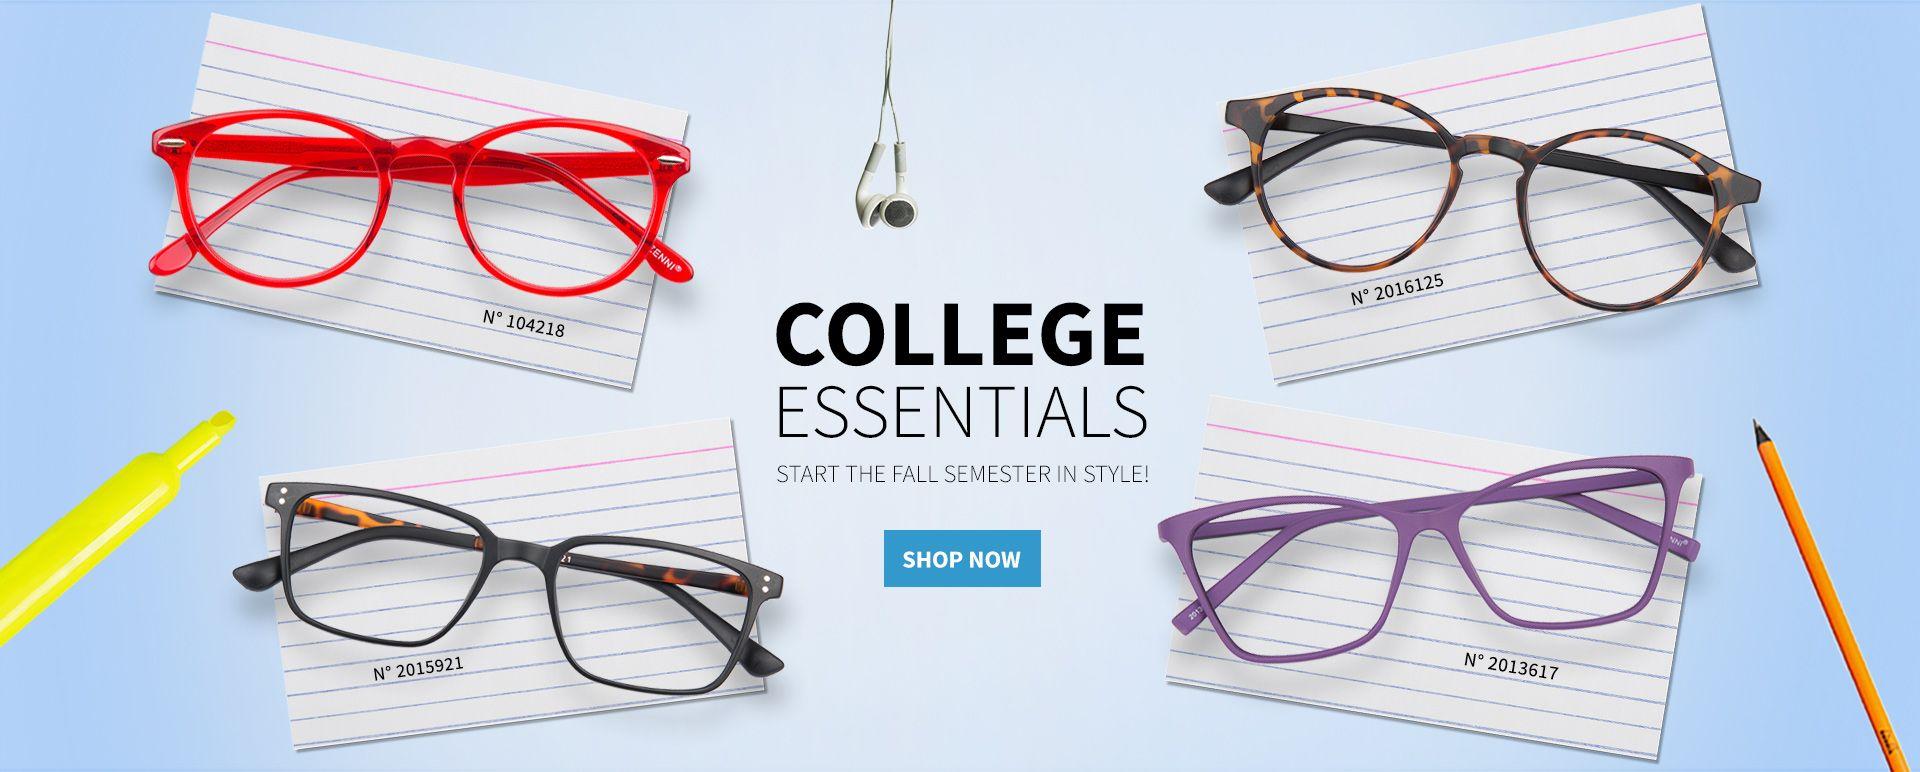 College essentials zenni optical zenni optical